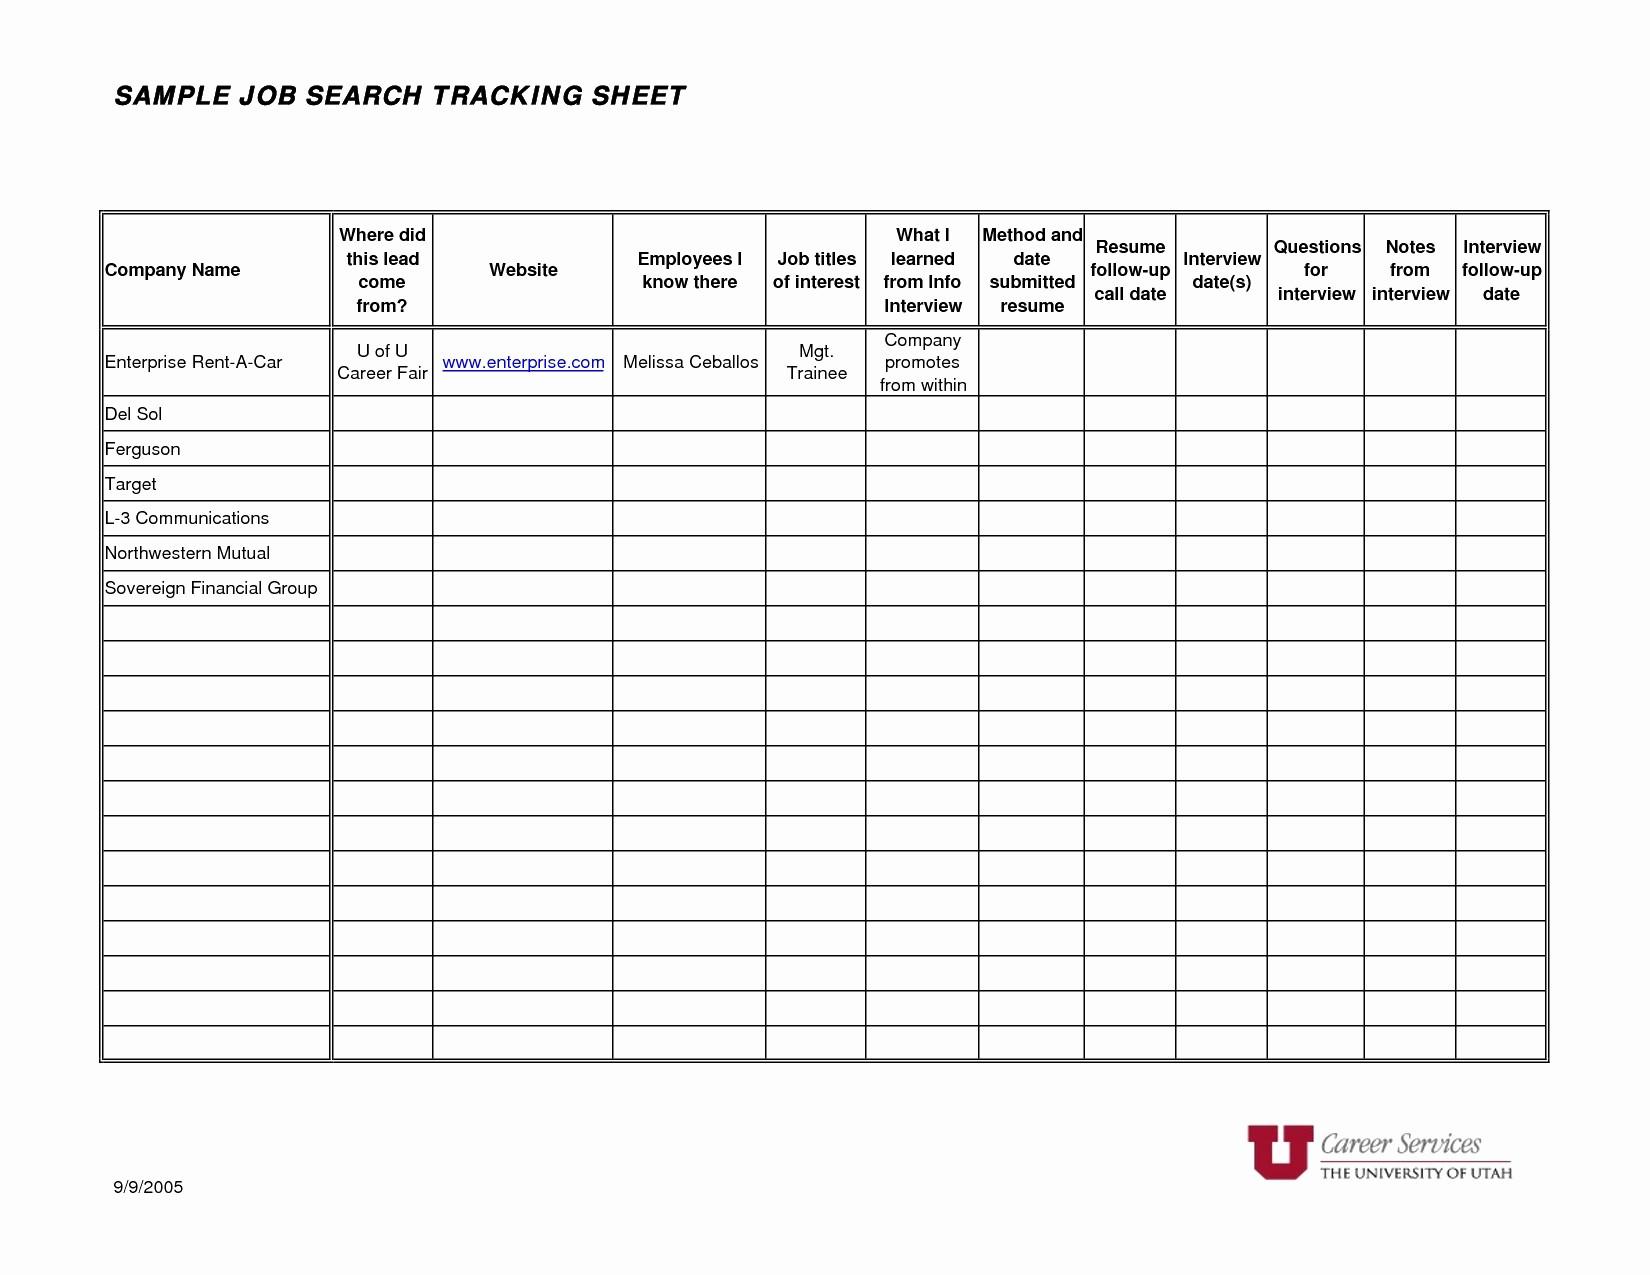 Excel Work order Tracking Spreadsheet Lovely Work order Tracking Template Goalblocketyco